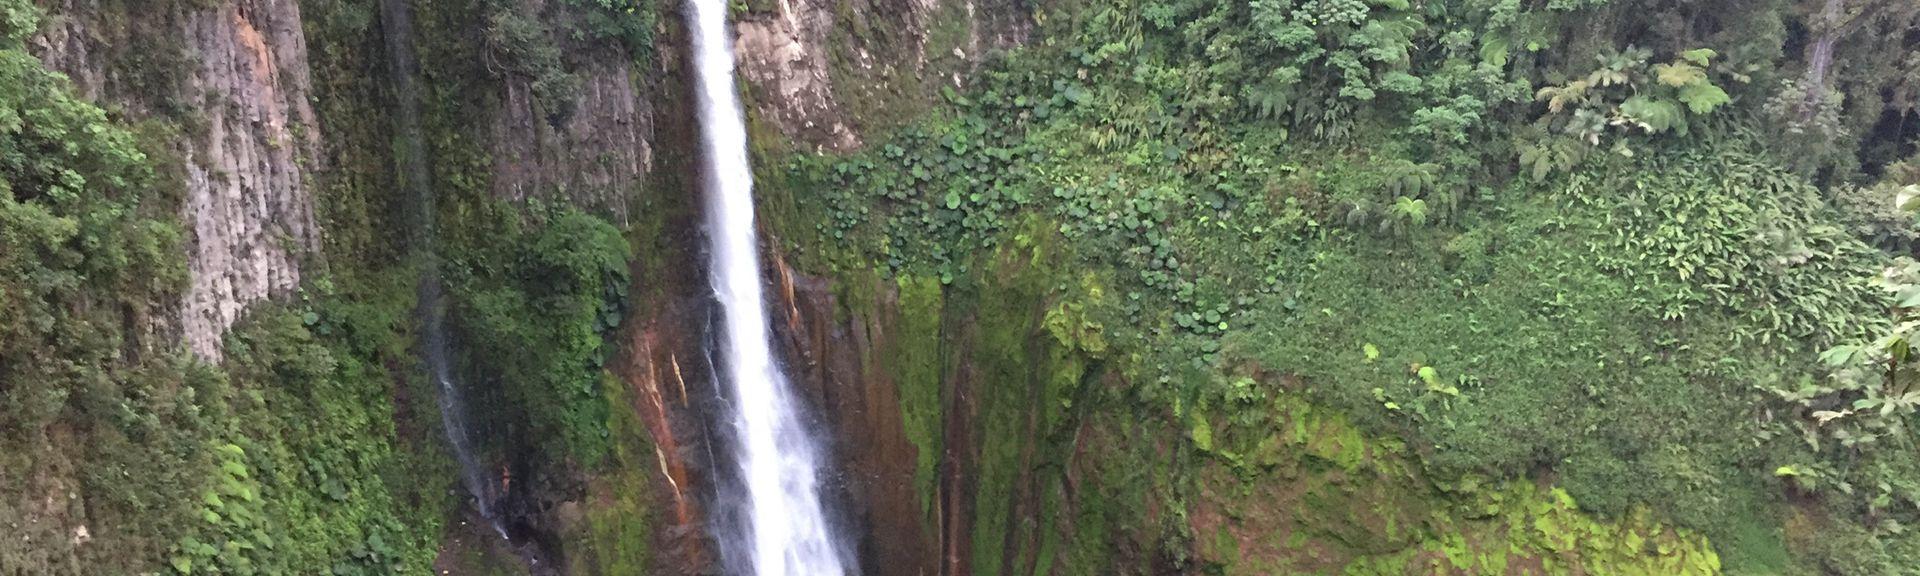 Santa Eulalia, Alajuela, Costa Rica